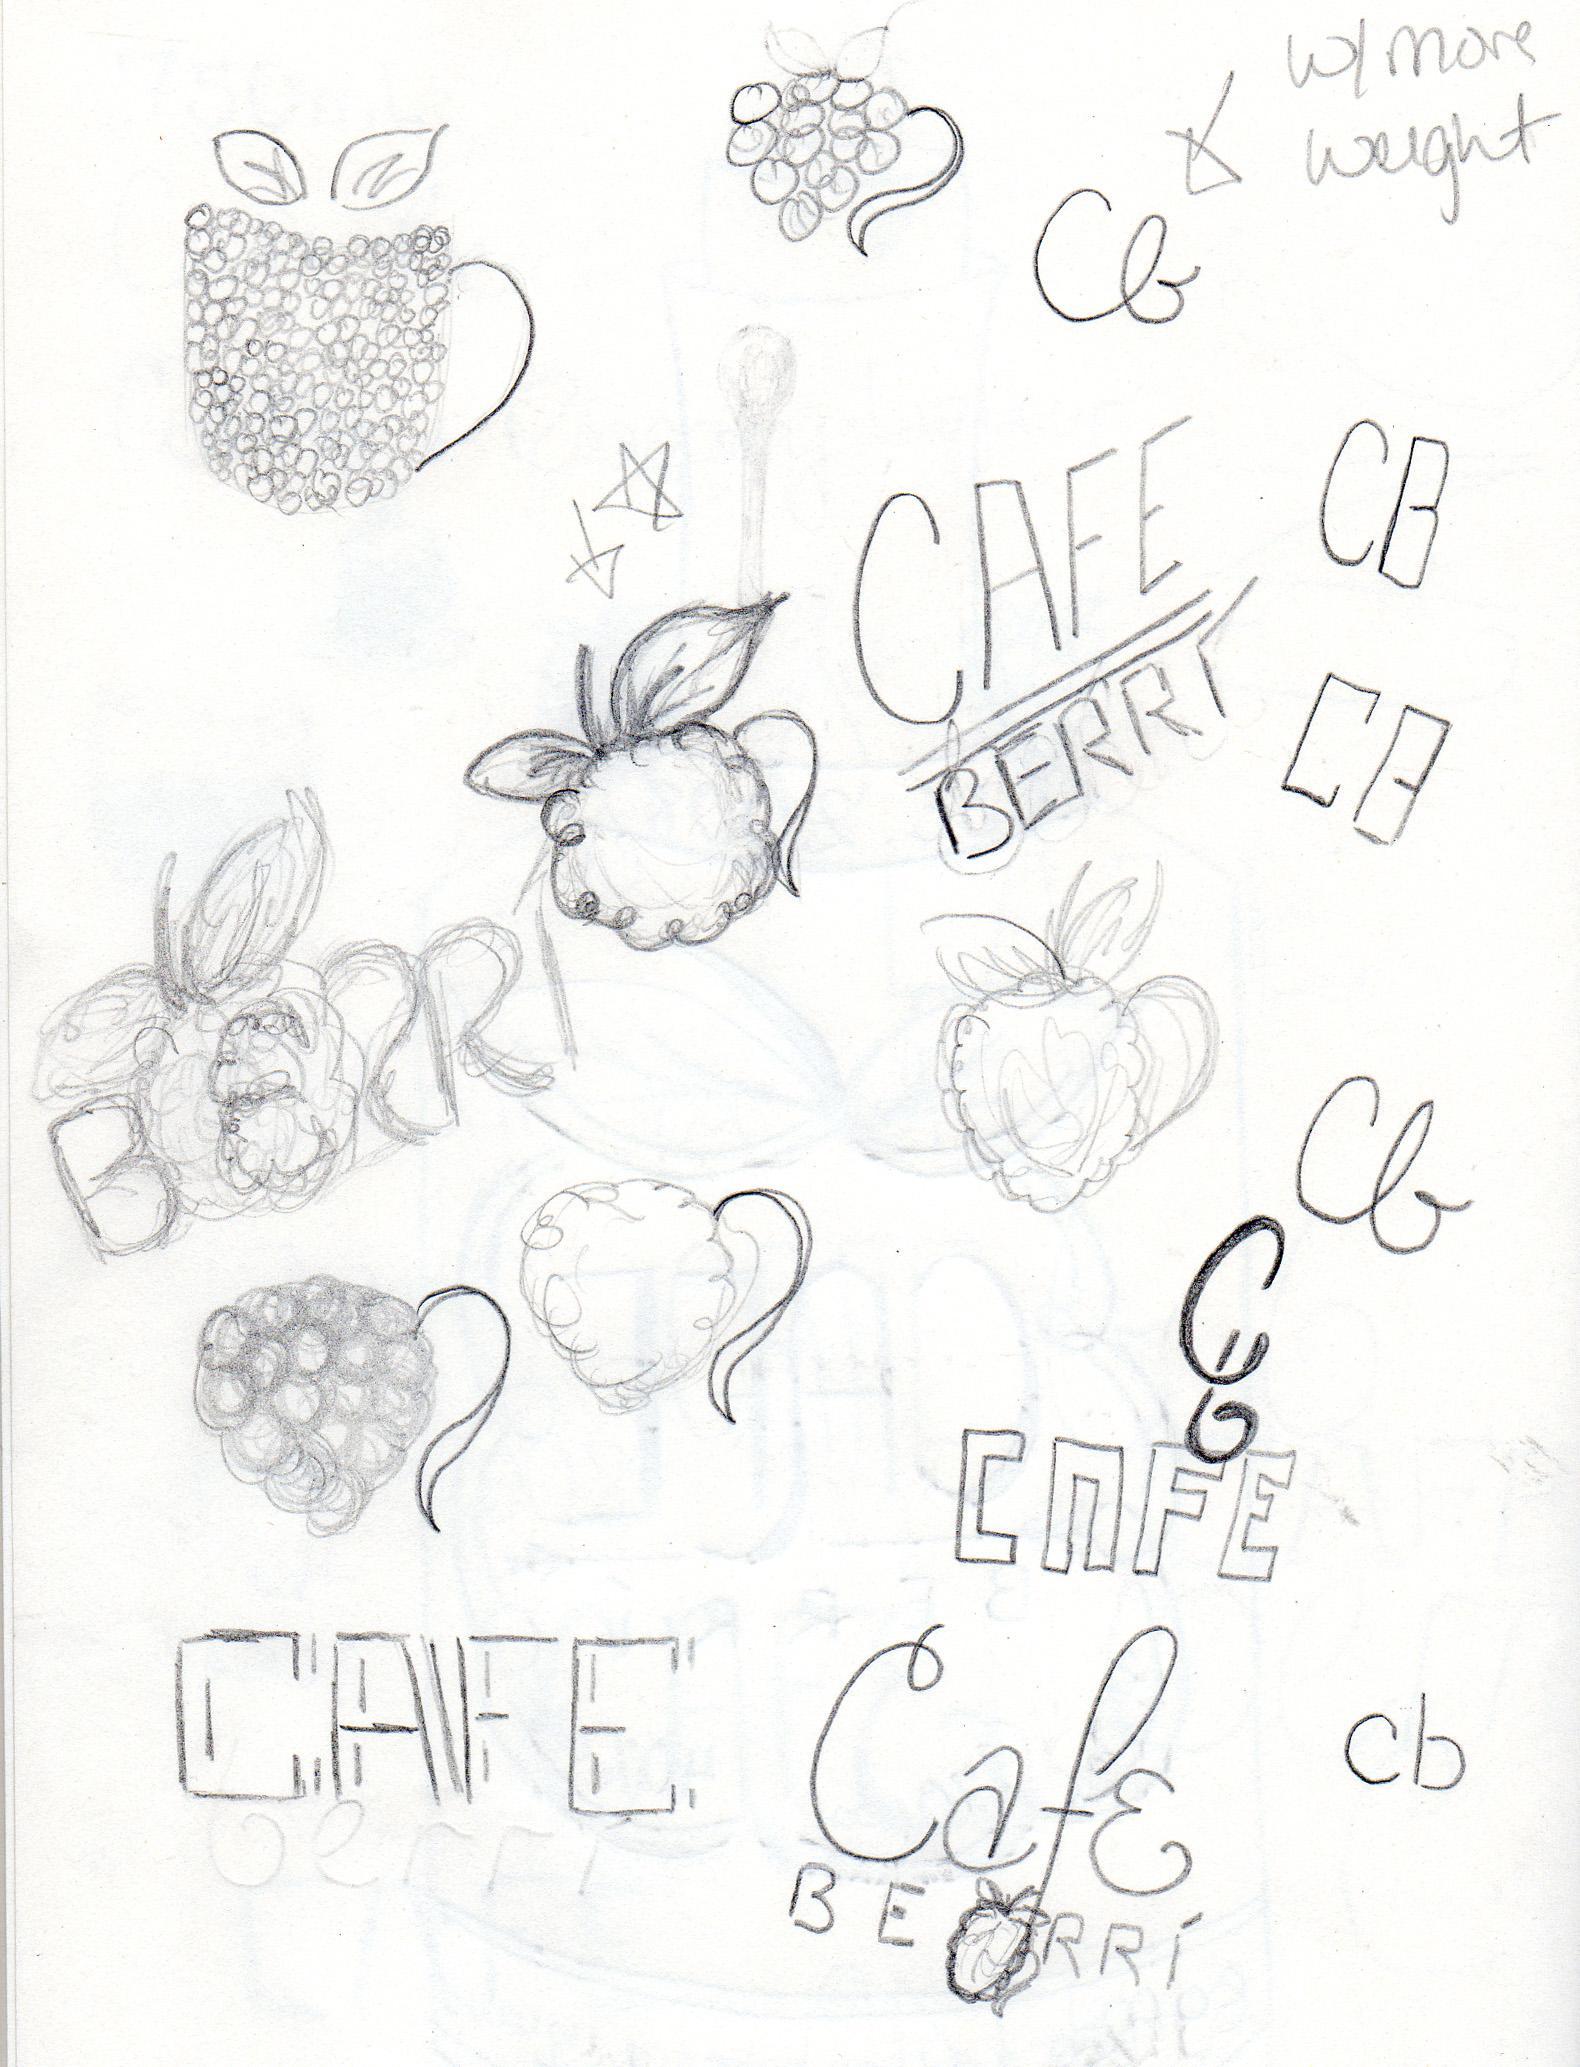 Cafe Berrí - image 3 - student project